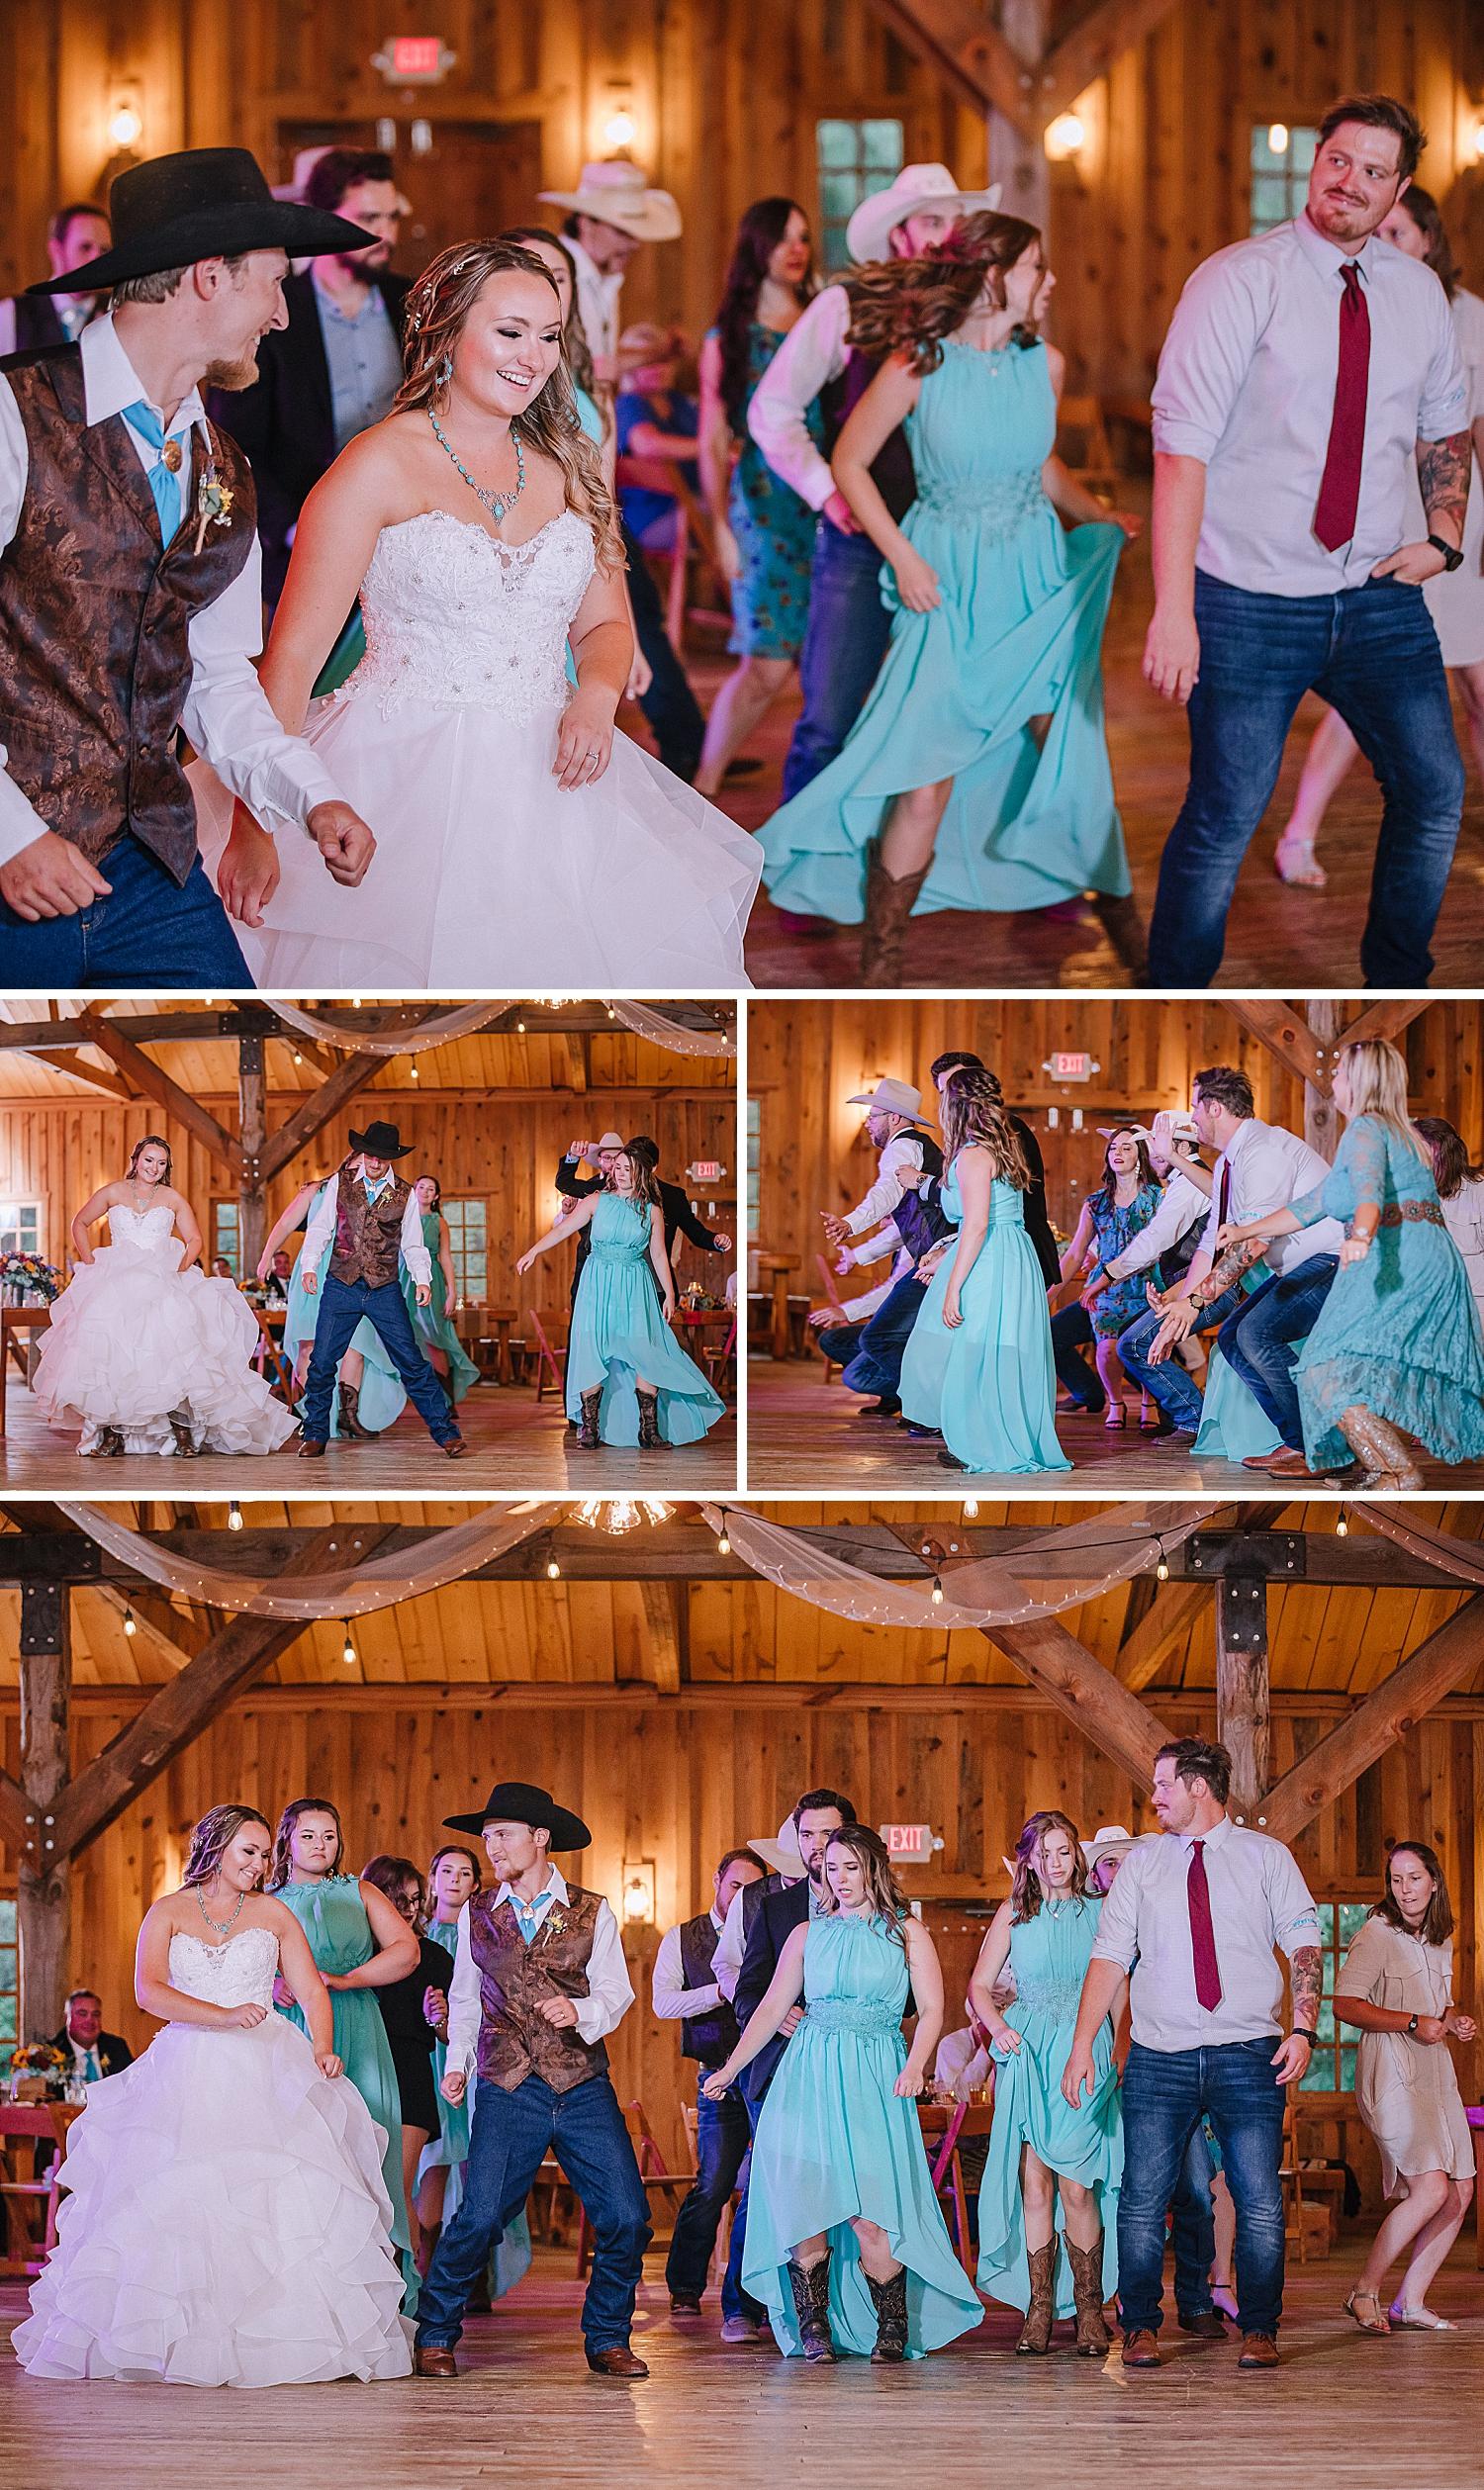 Carly-Barton-Photography-Old-Town-Texas-Rustic-Wedding-Photos-Sunflowers-Boots-Kyle-Texas_0083.jpg